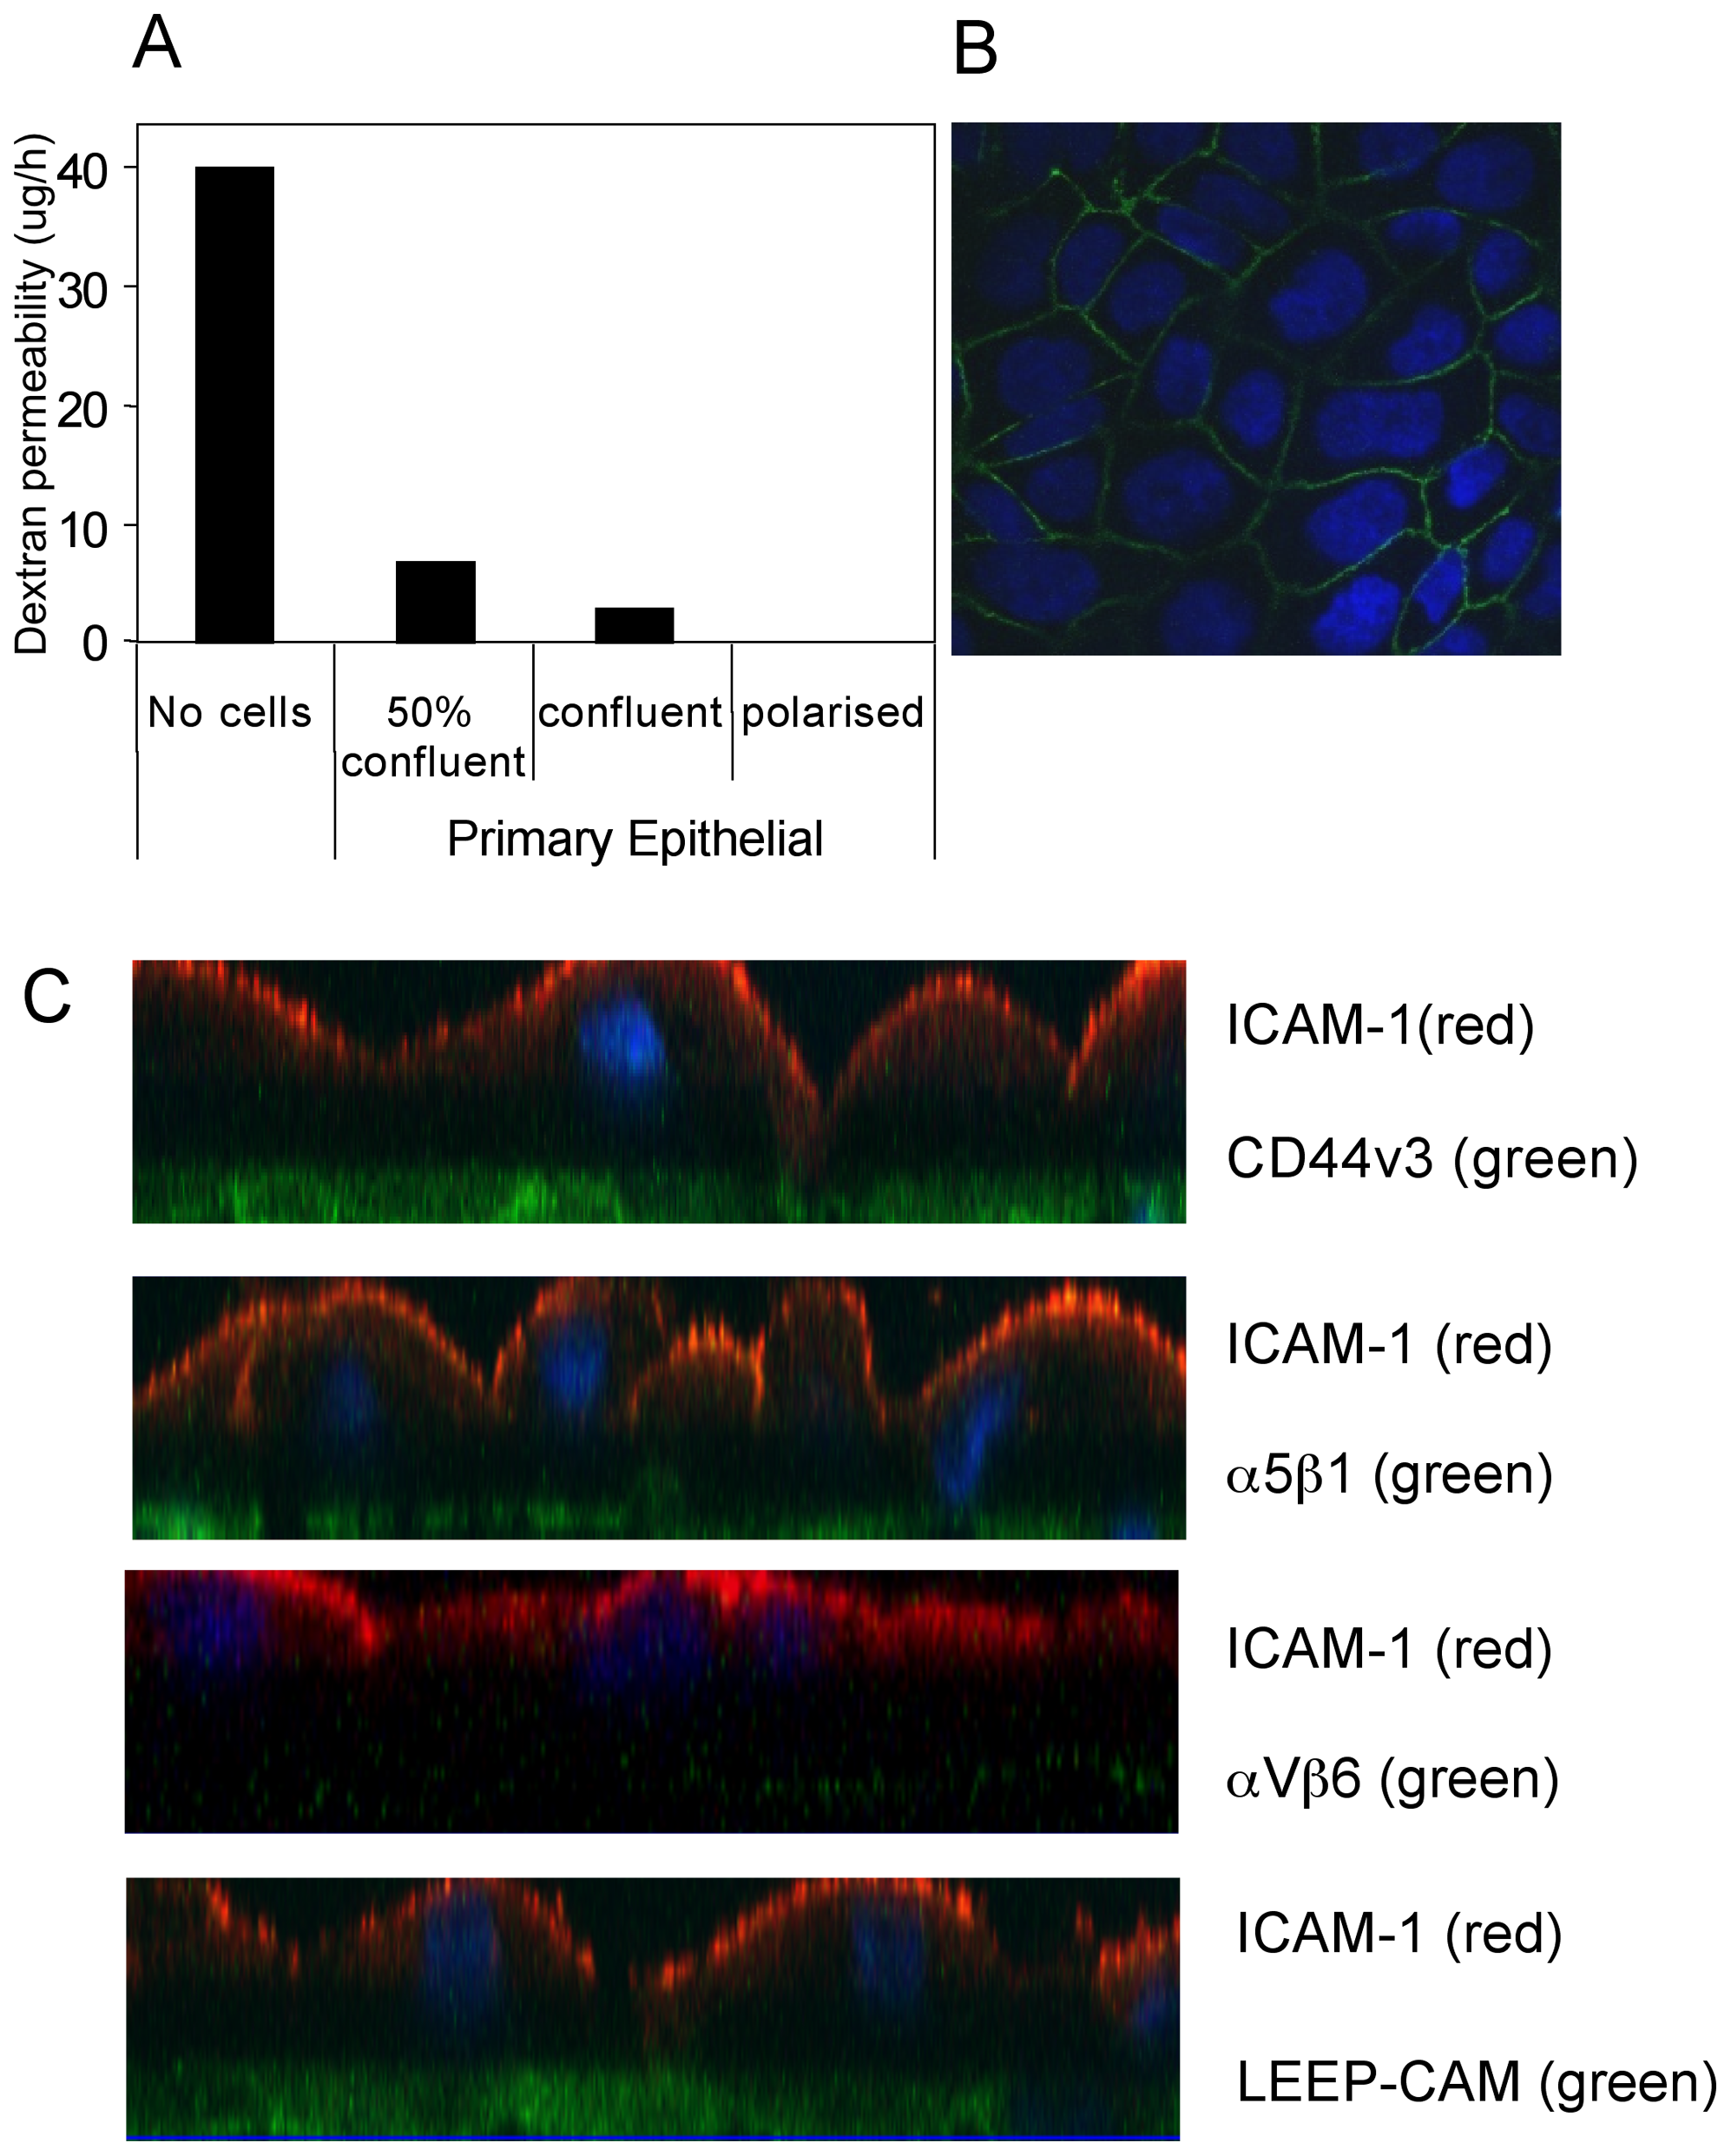 Polarization of primary tonsillar epithelial cells.